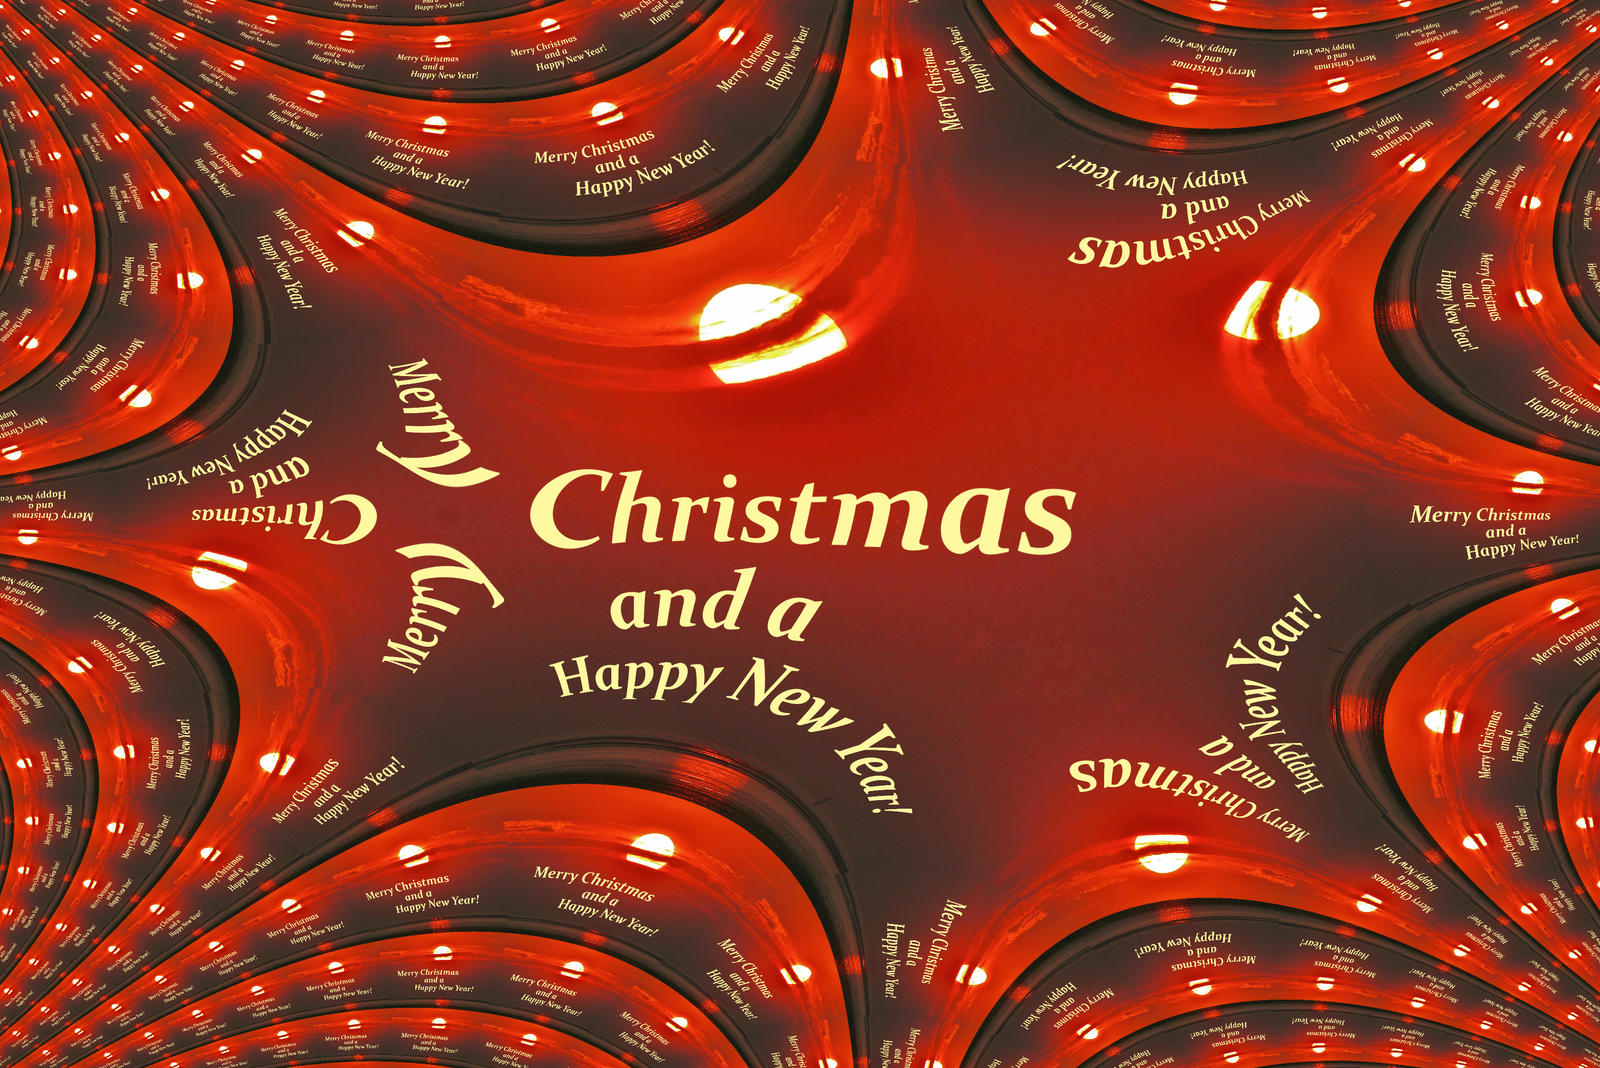 holiday season greetings